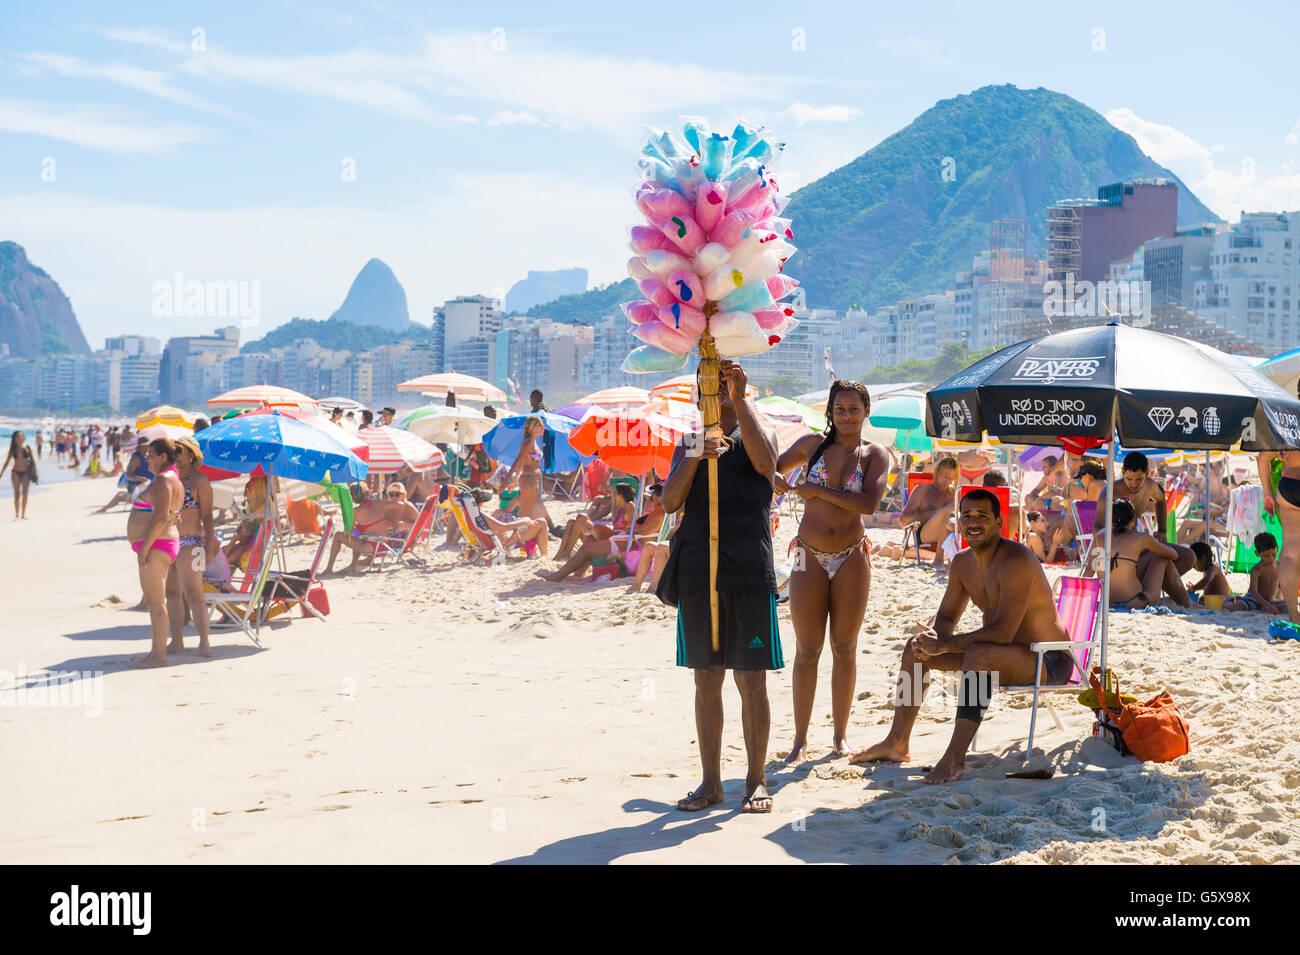 RIO DE JANEIRO - FEBRUARY 27, 2016: Brazilian beach vendor selling cotton candy floss approaches customers on Copacabana - Stock Image